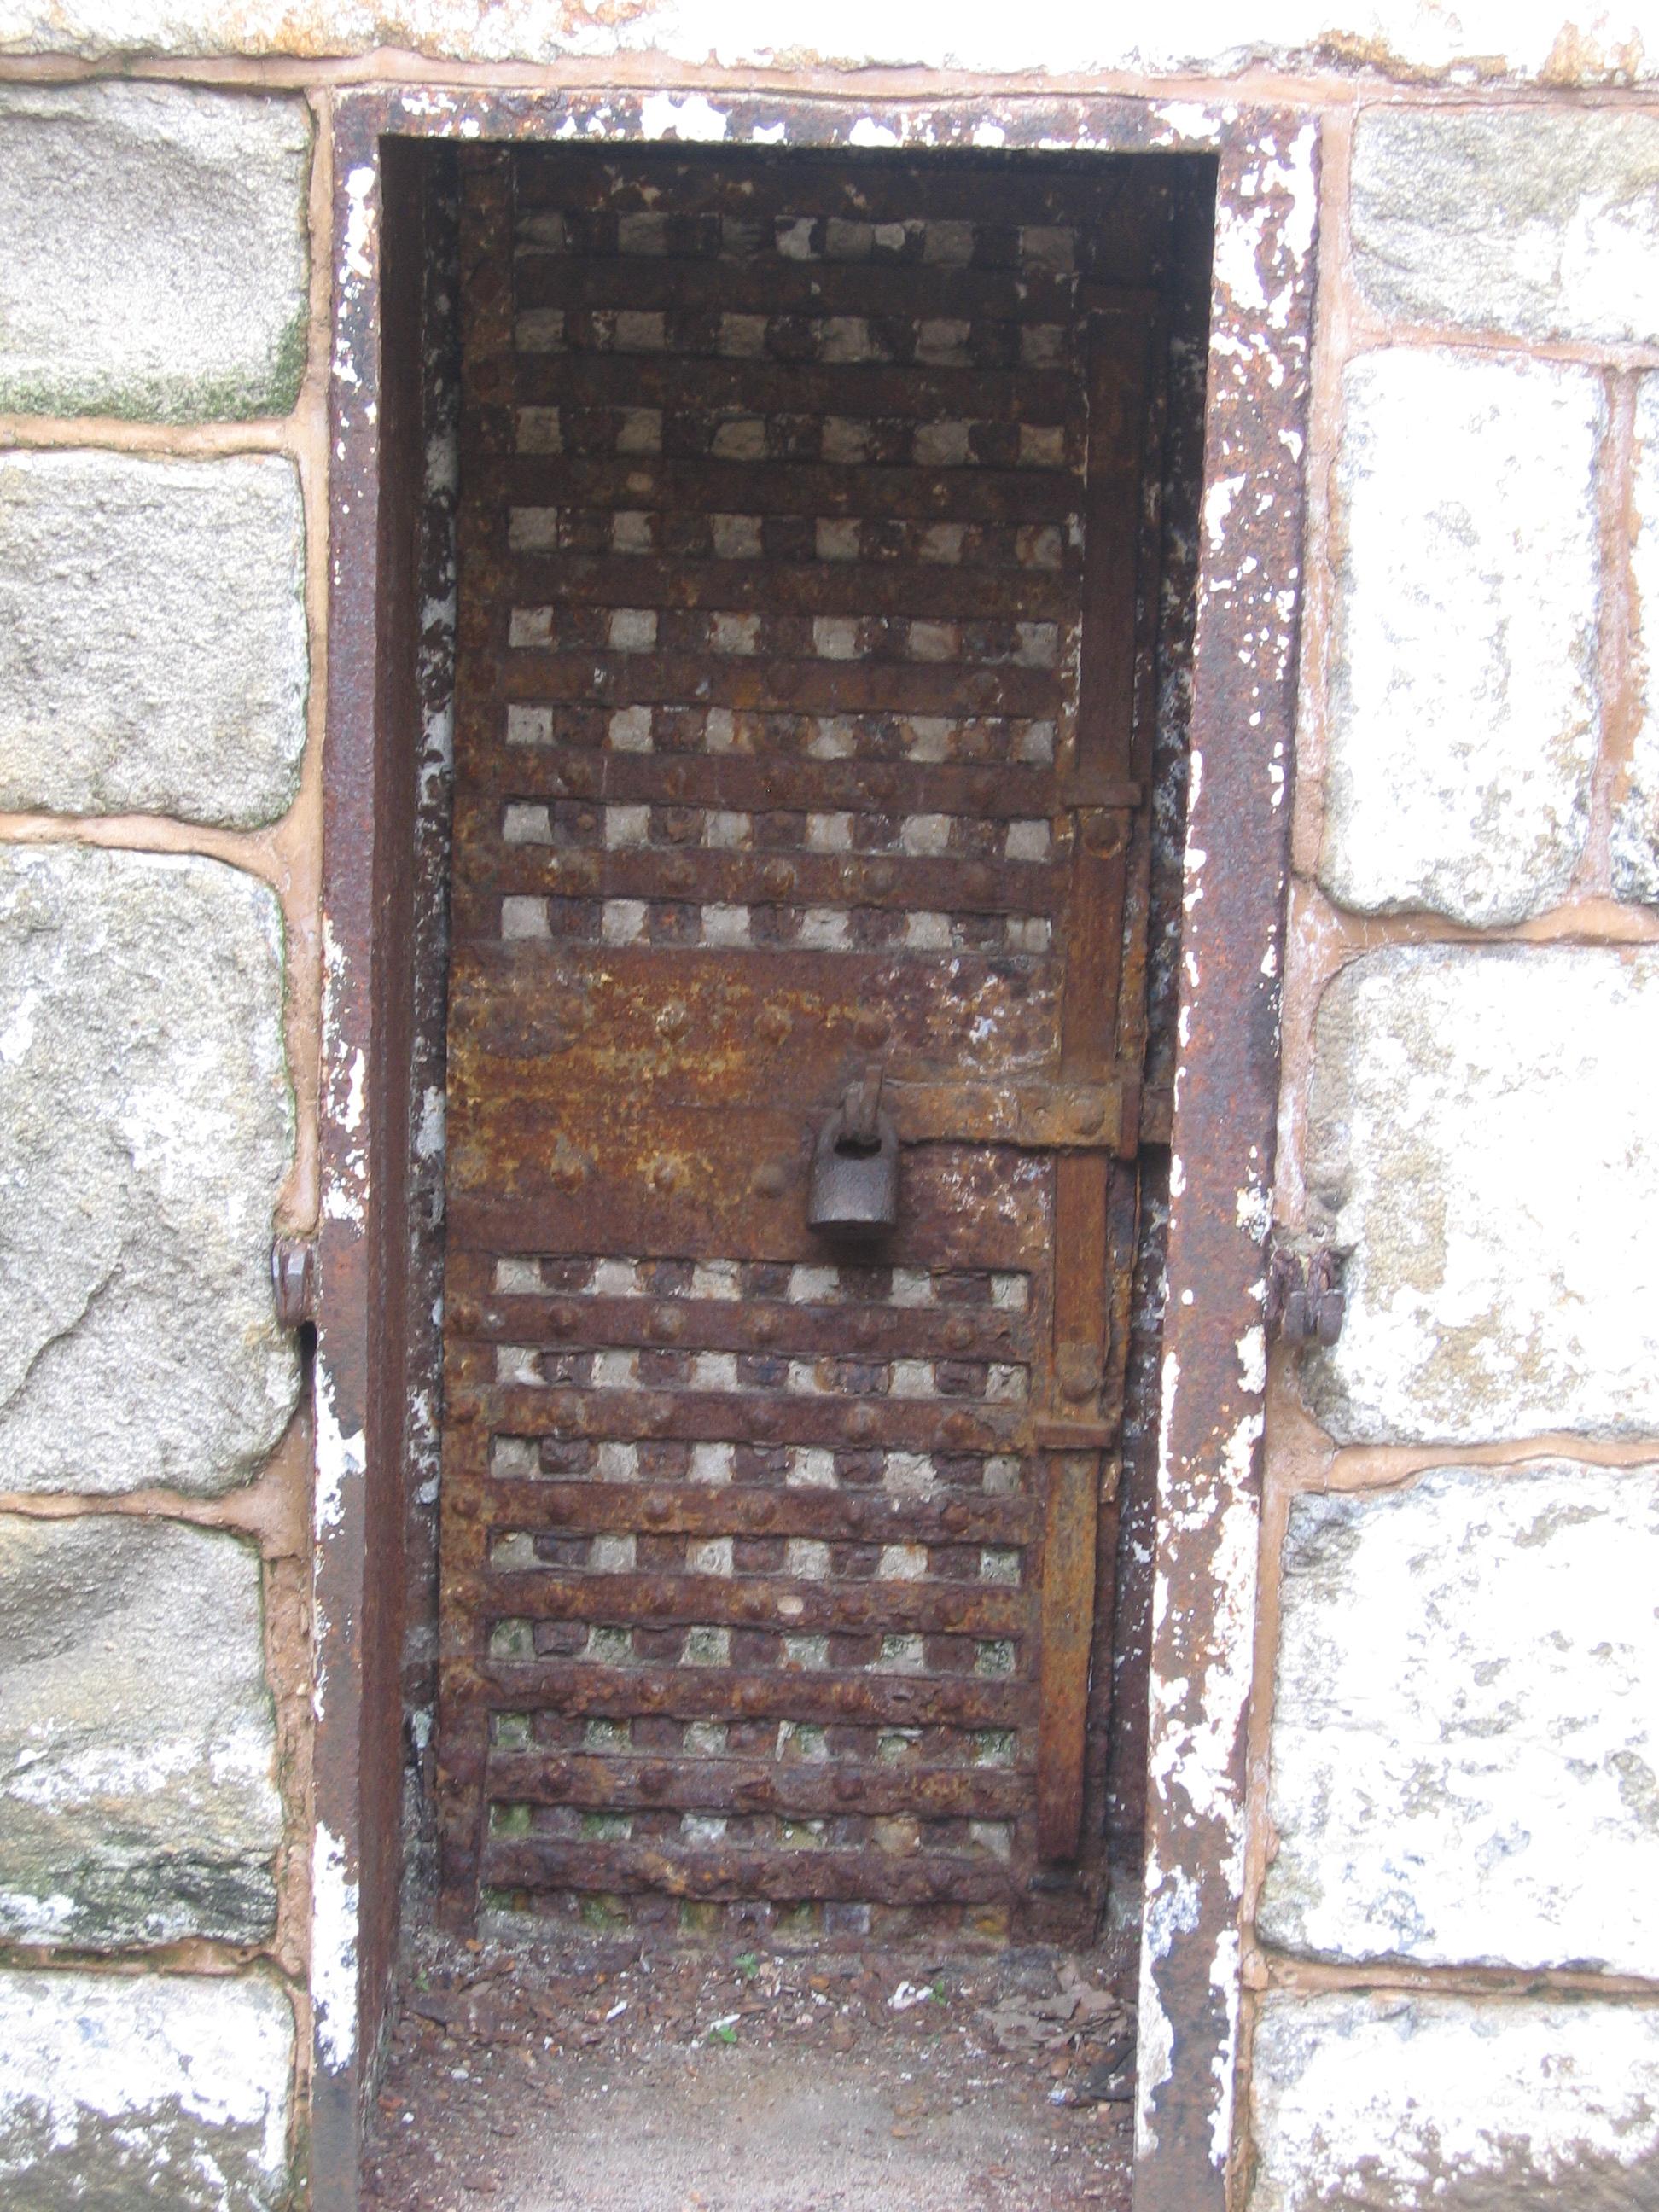 FilePadlocked Door Eastern State Penitentiary.JPG & File:Padlocked Door Eastern State Penitentiary.JPG - Wikimedia Commons